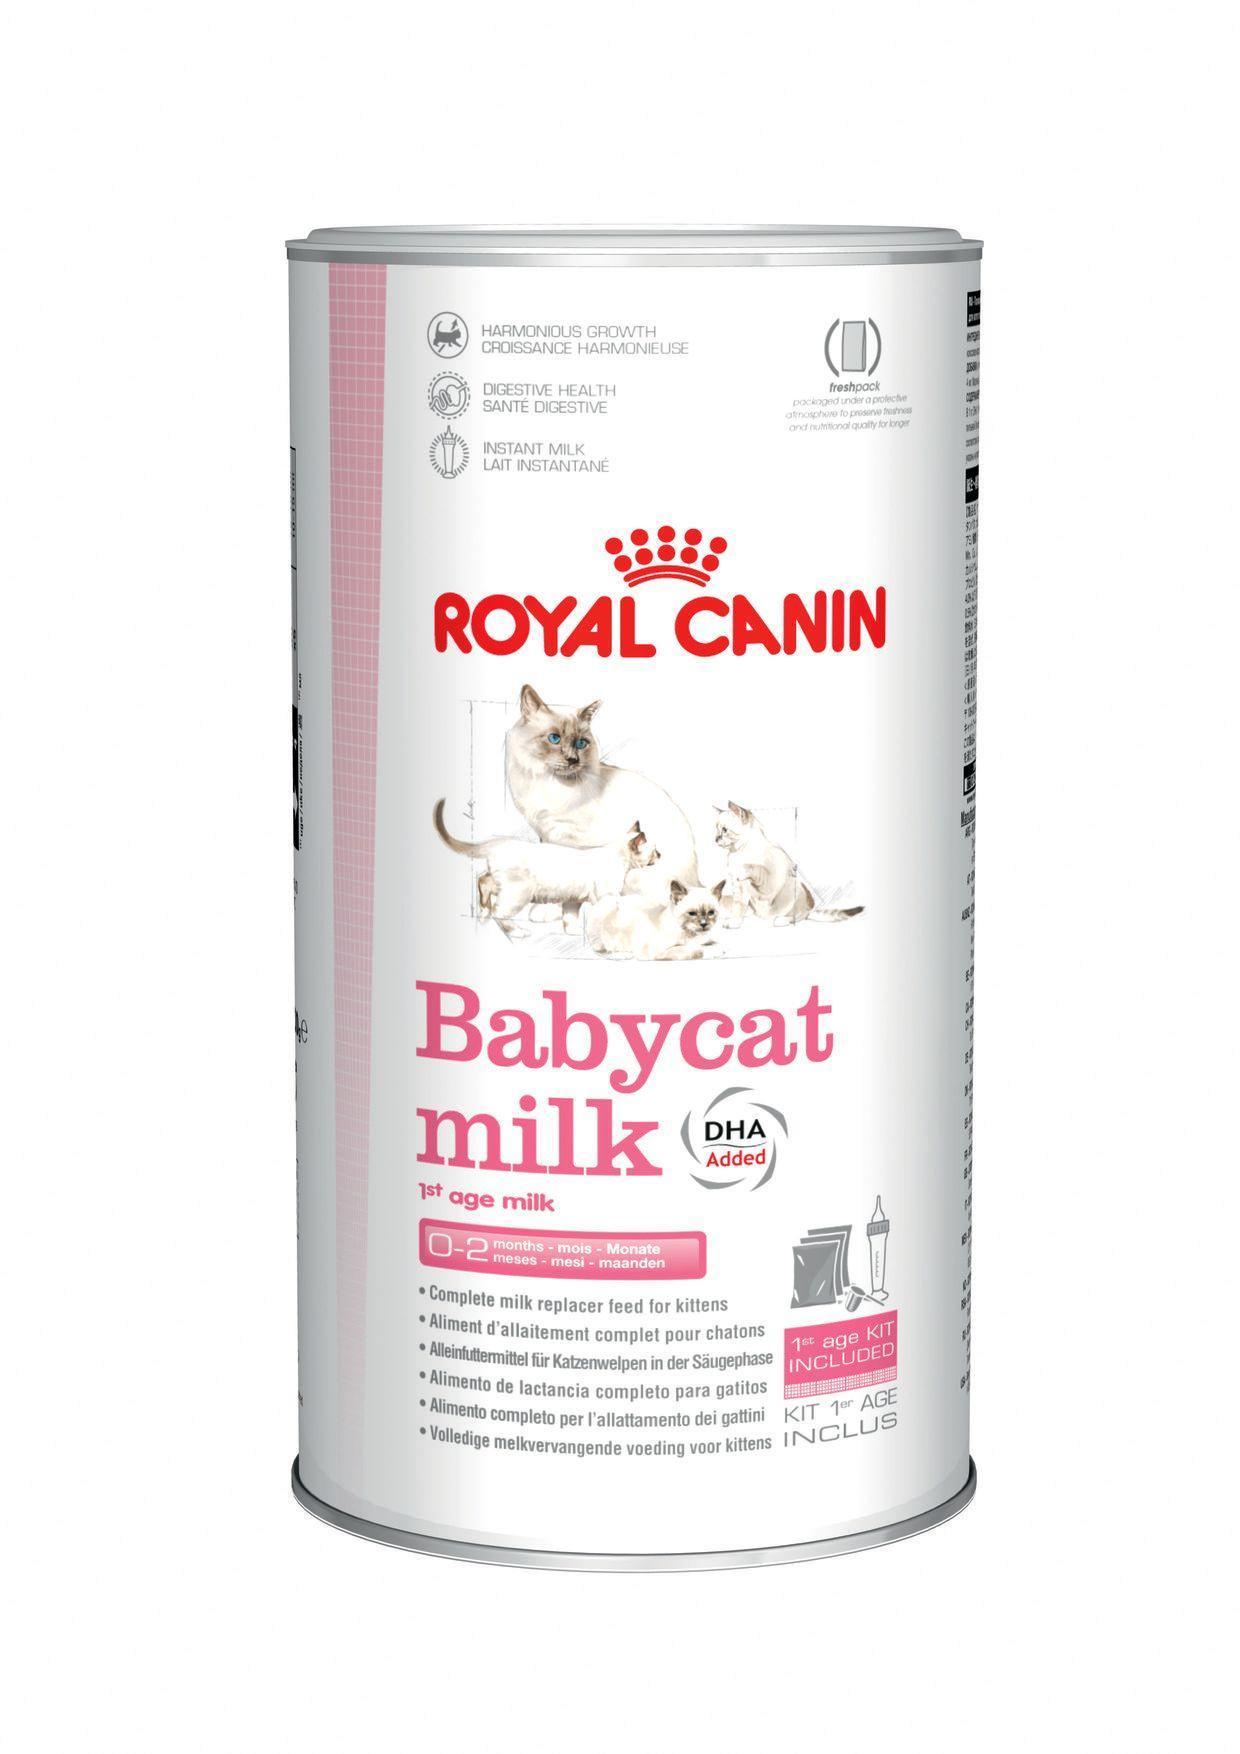 Royal Canin Babycat Milk 1stage 300gr